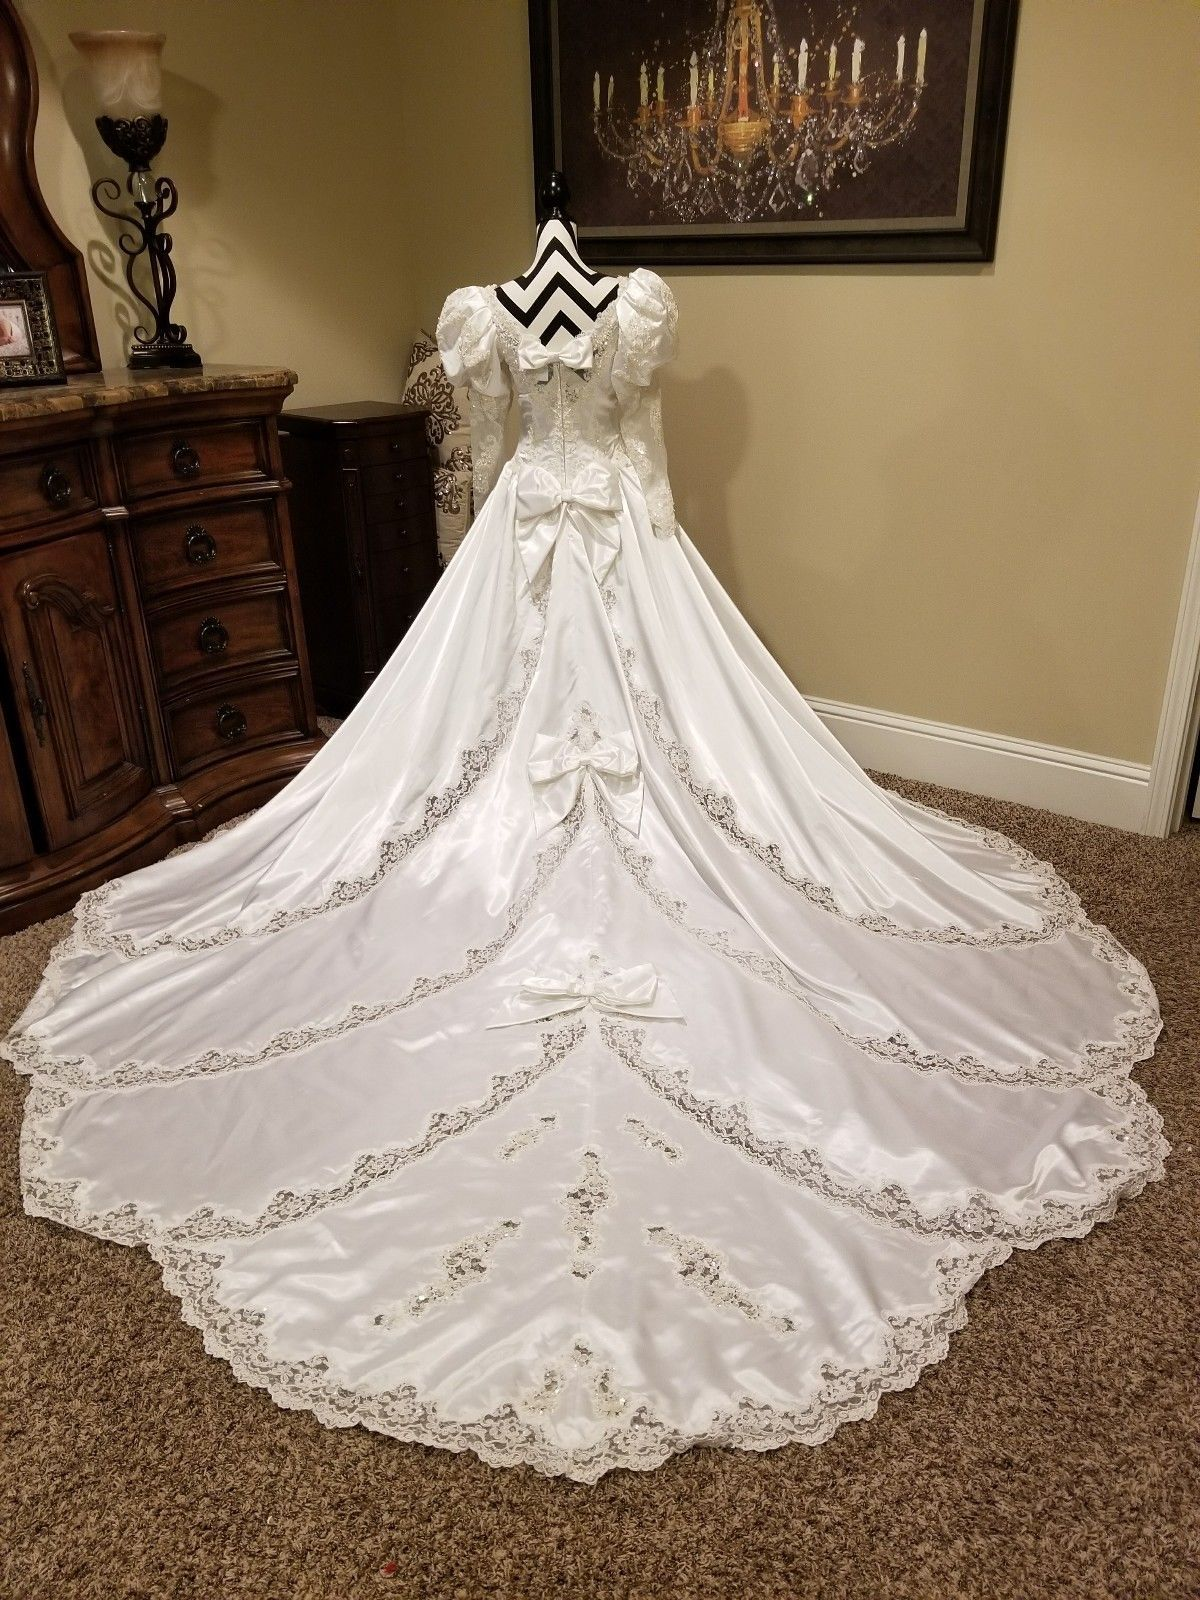 Vintage 80s 90s Wedding Dress Gown Size 6 Victorian Puff Sleeves Long Train Mint 90s Wedding Dress Wedding Dresses Beautiful Wedding Gowns [ 1600 x 1200 Pixel ]